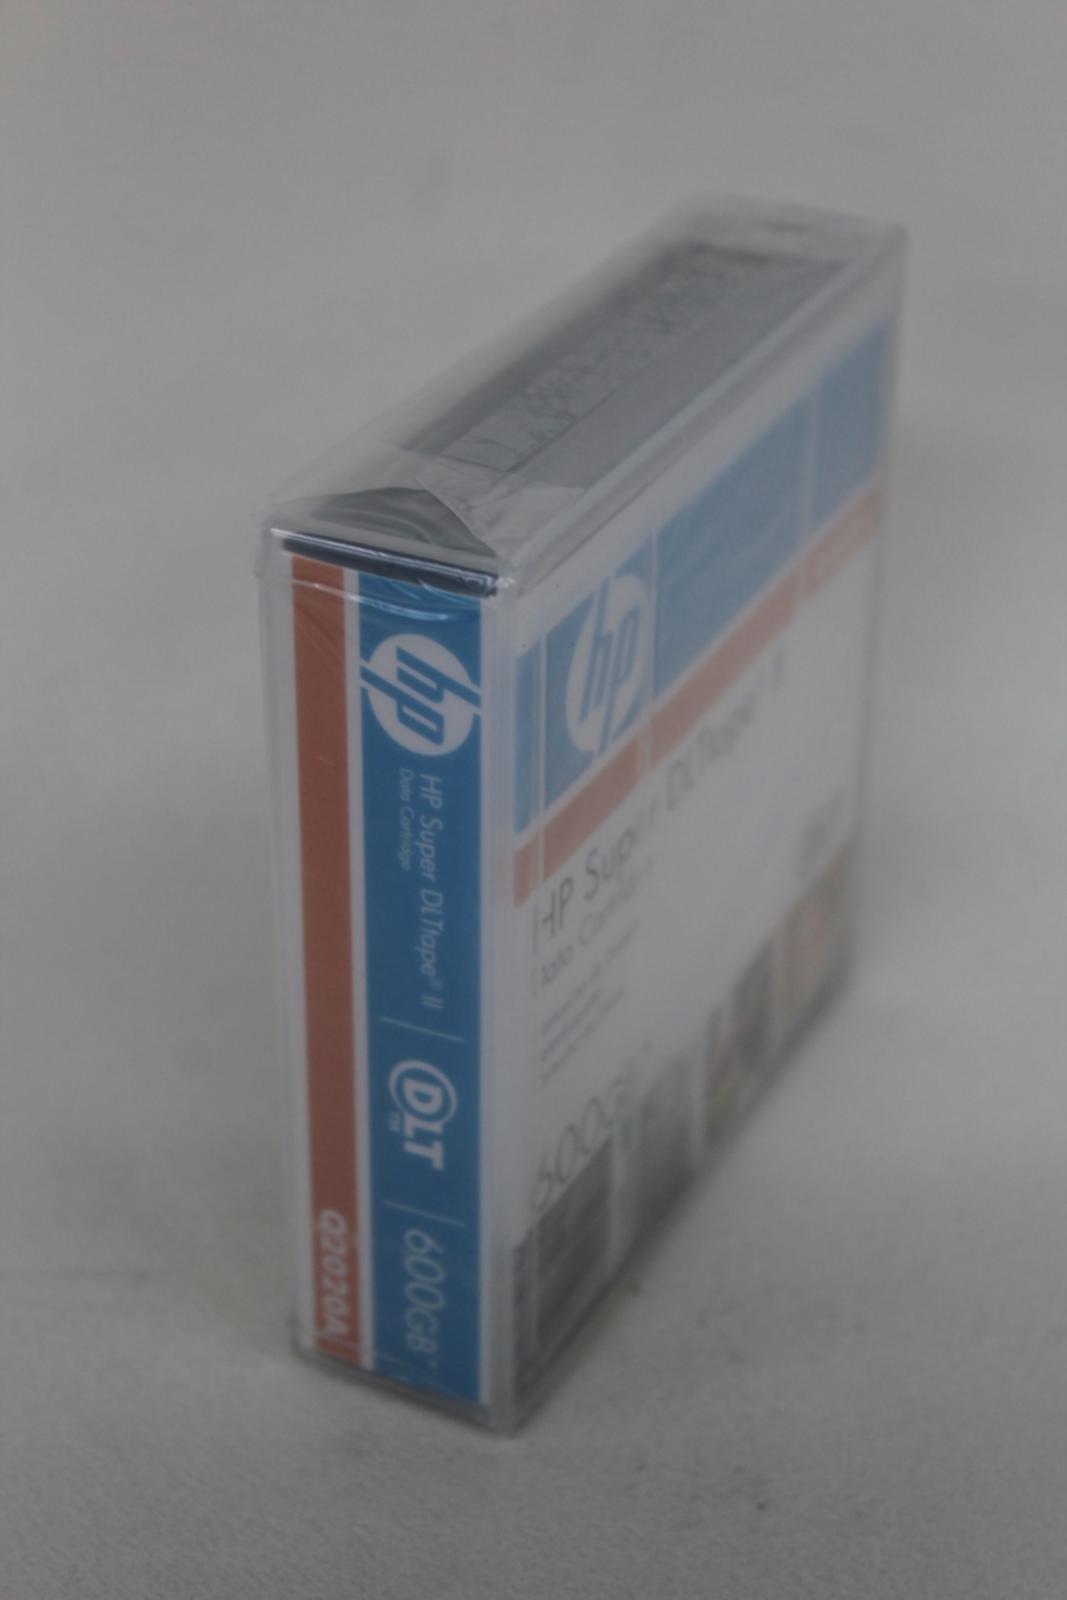 HP-Q2020A-Super-DLtape-II-Data-Tape-Square-cartouche-600-Go-job-lot-4x-NEUF miniature 7